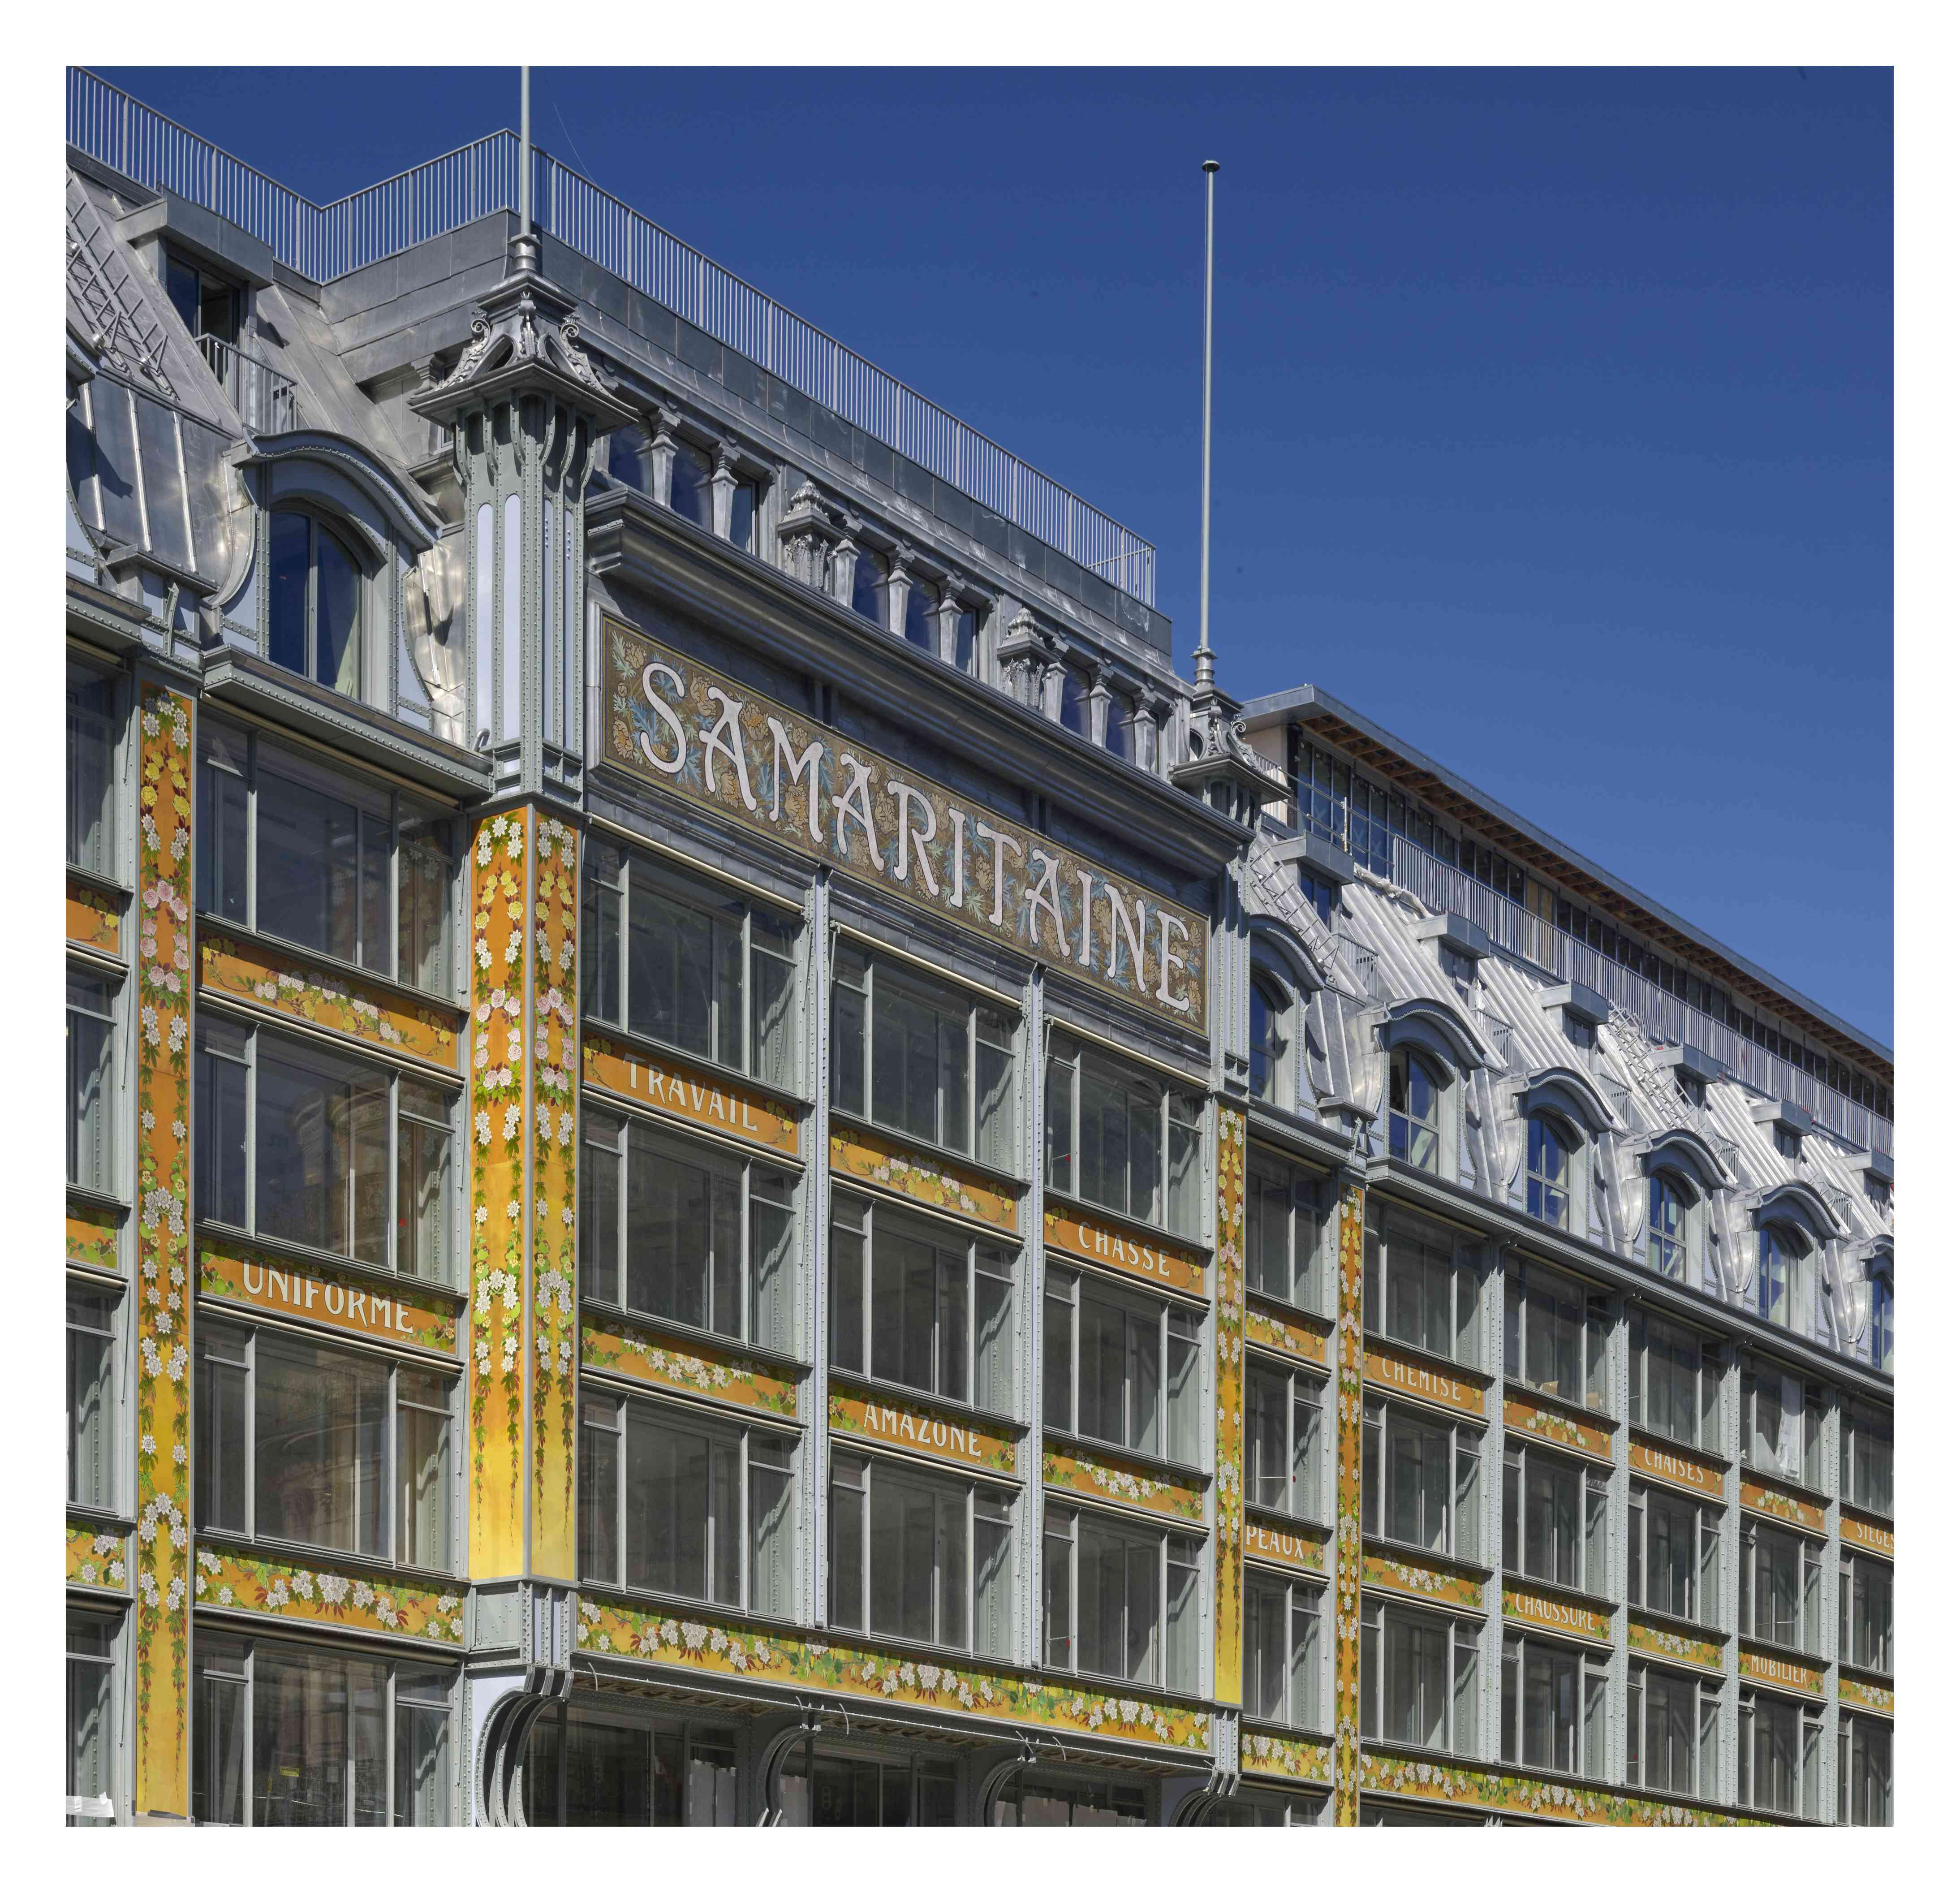 larger view of the art nouveau facade